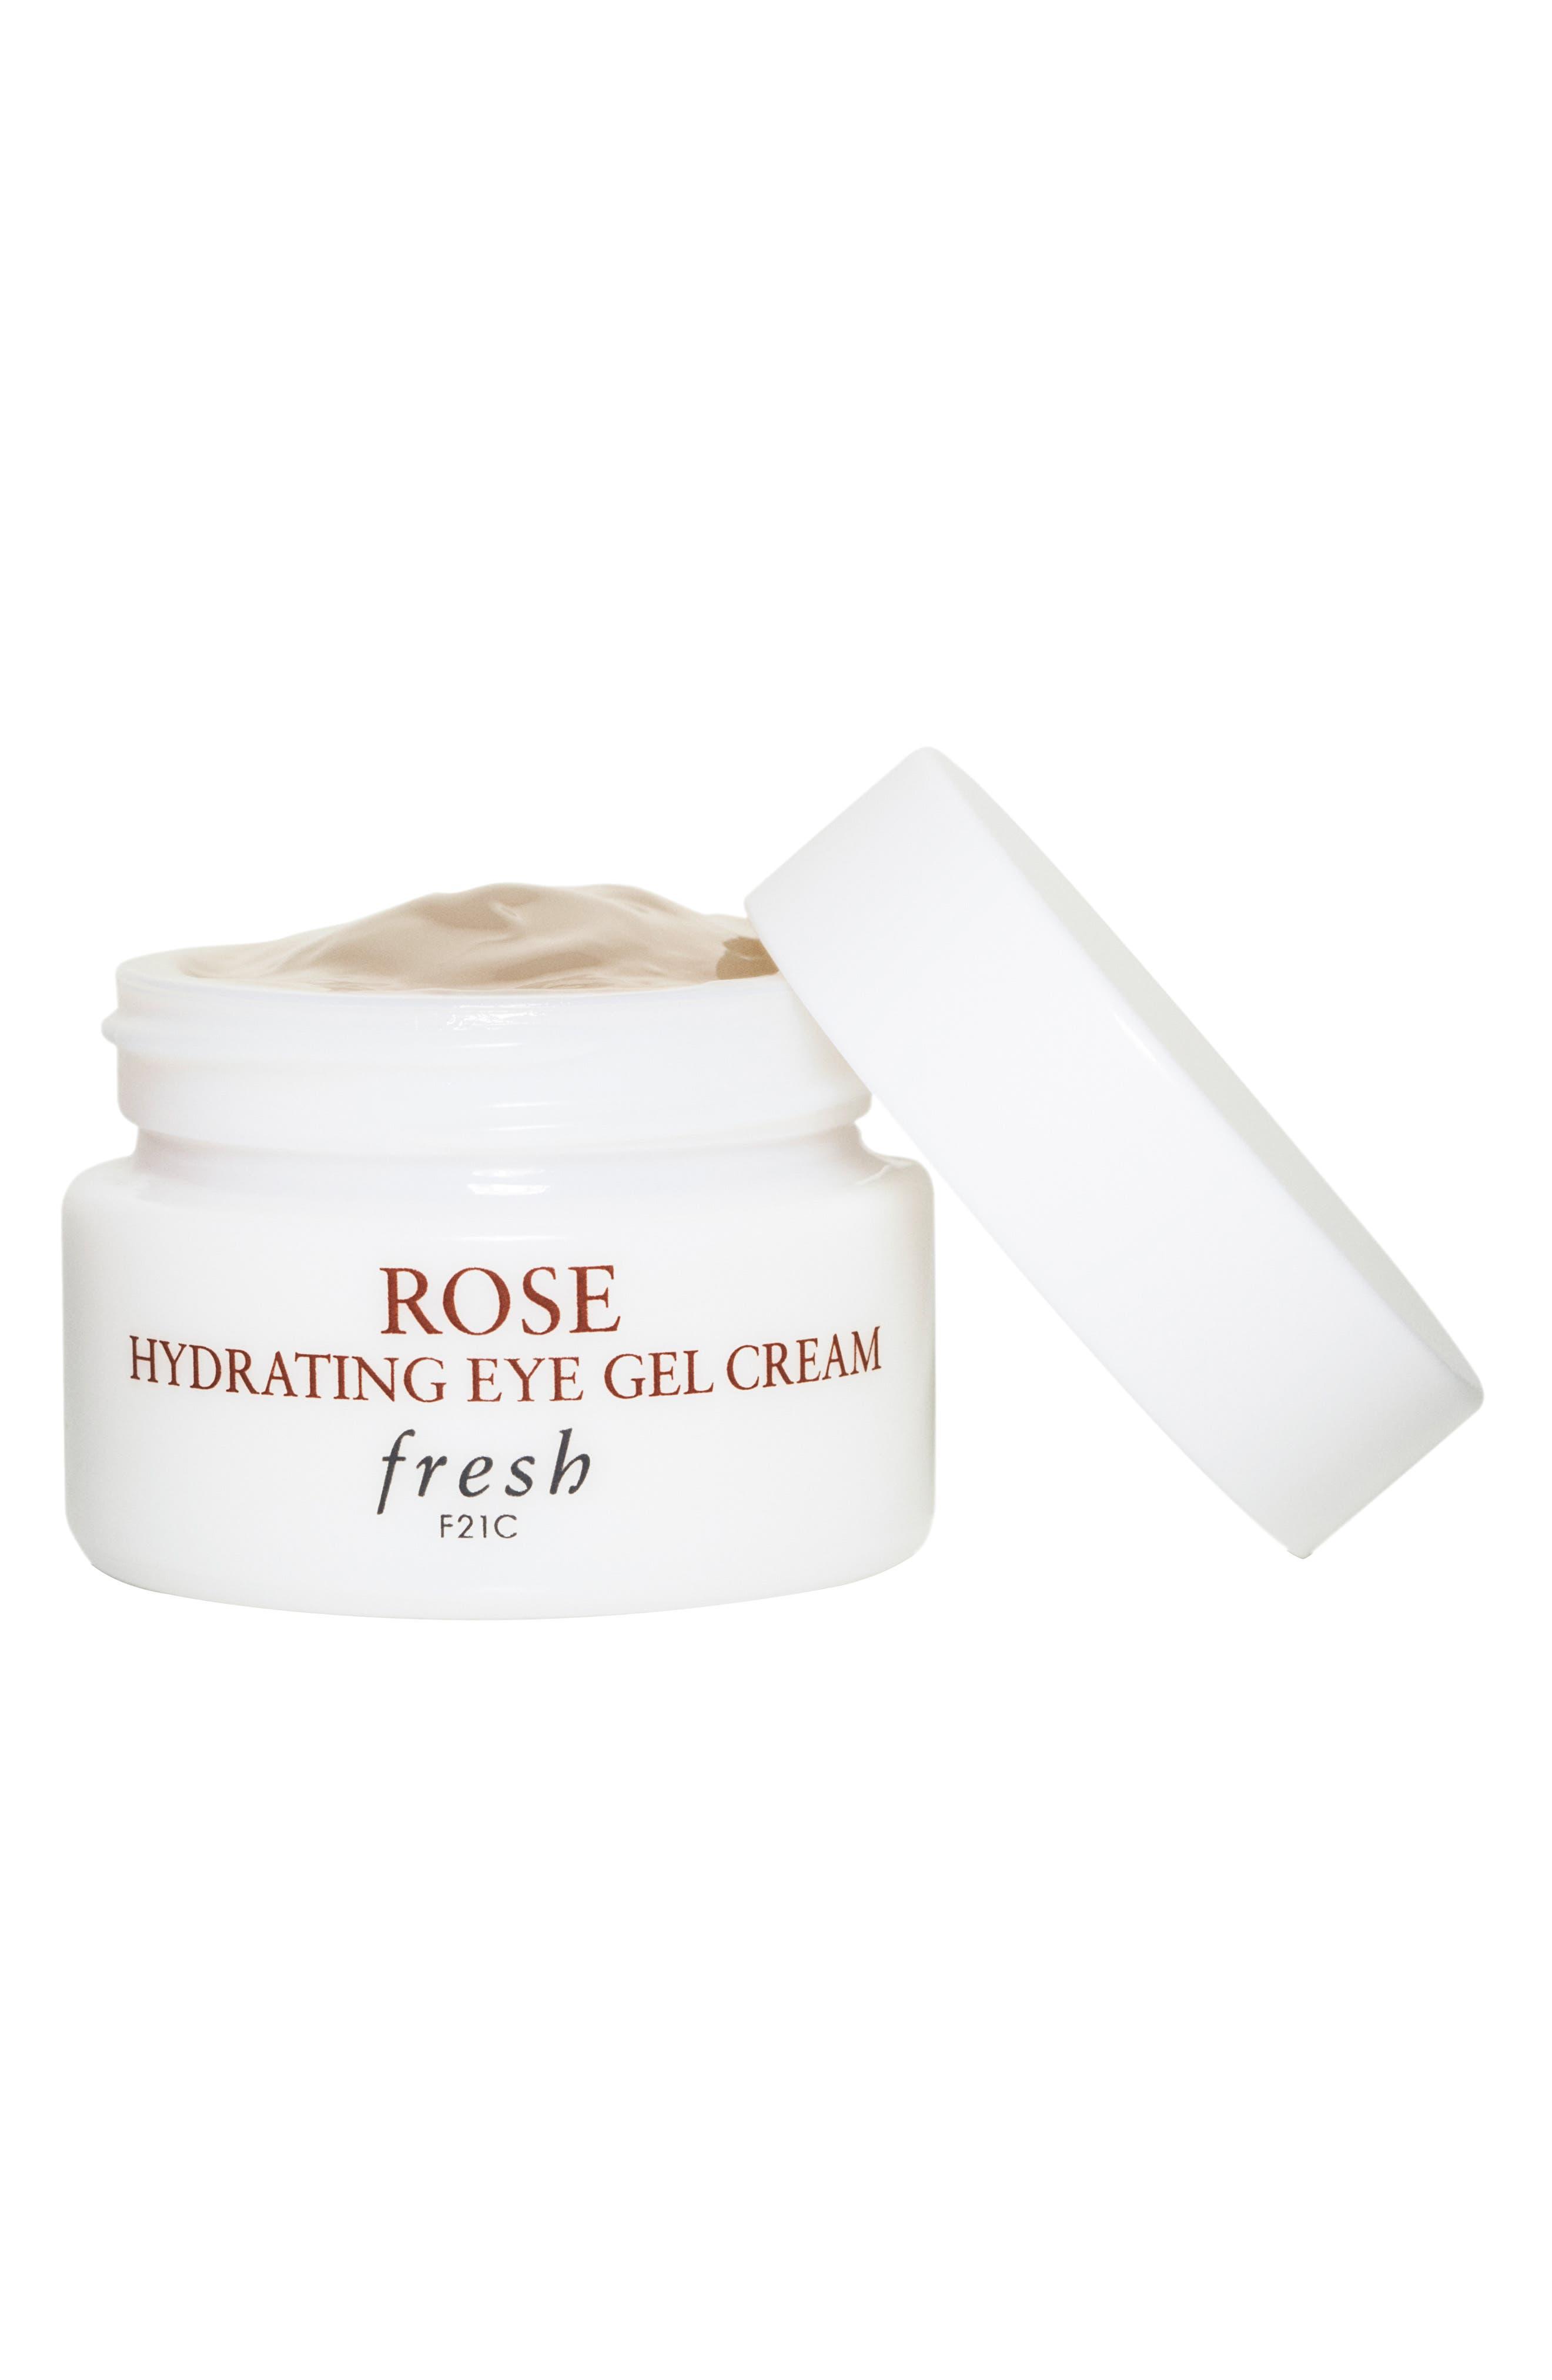 Rose Hydrating Eye Gel Cream,                             Main thumbnail 1, color,                             NO COLOR